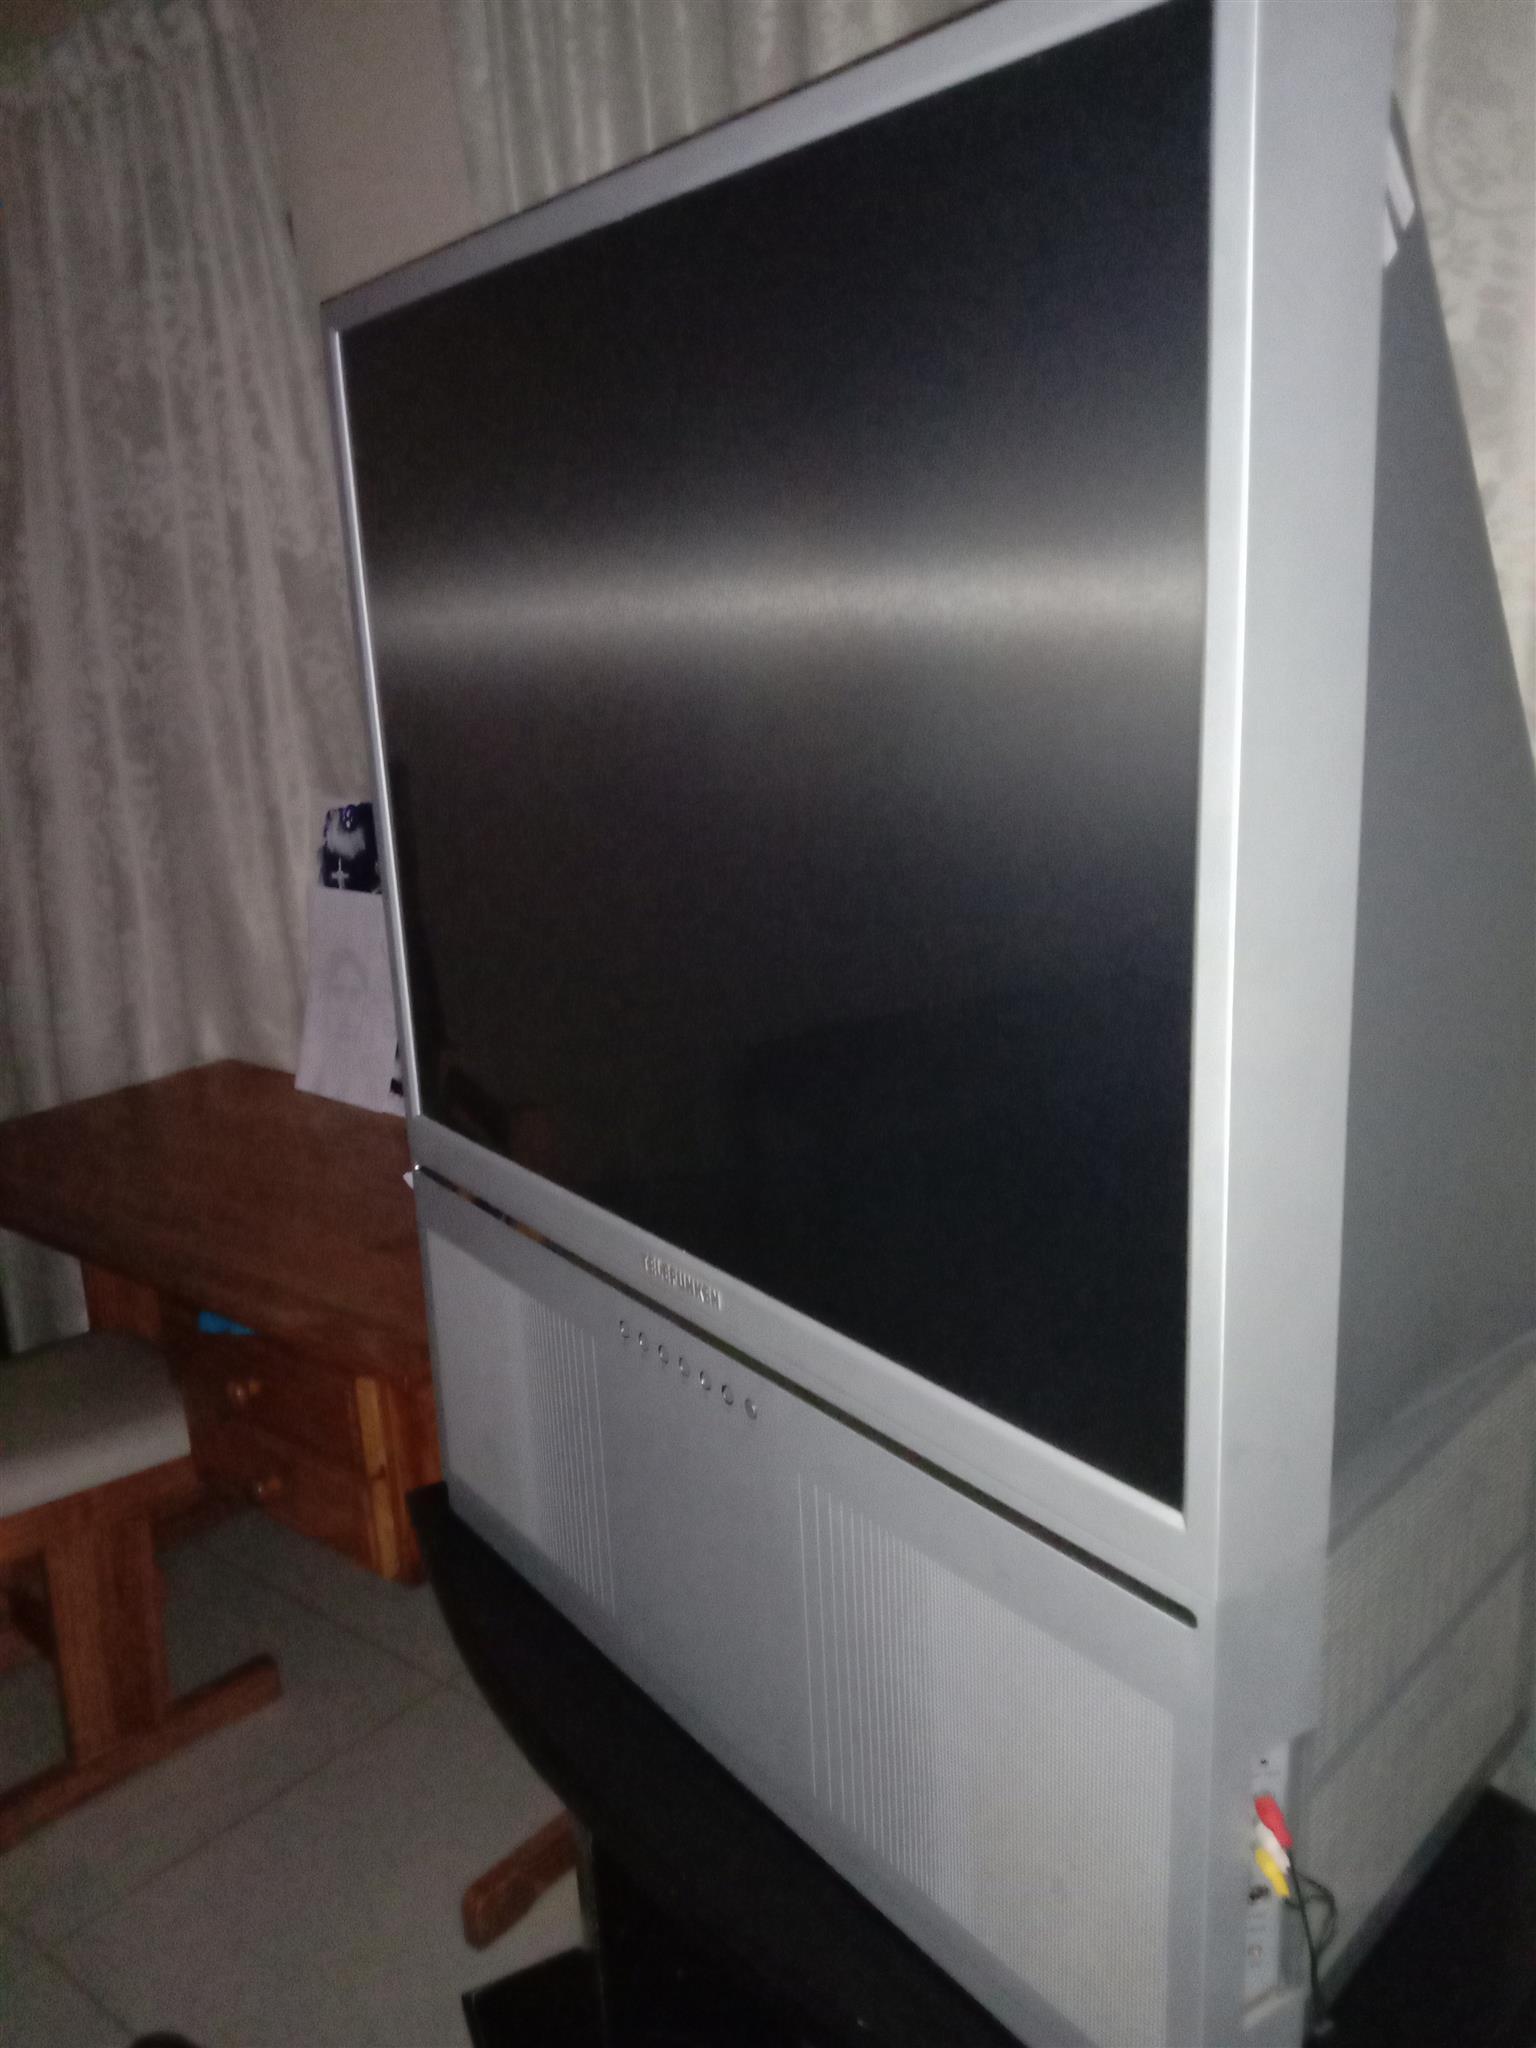 Big Screen Samsung TV